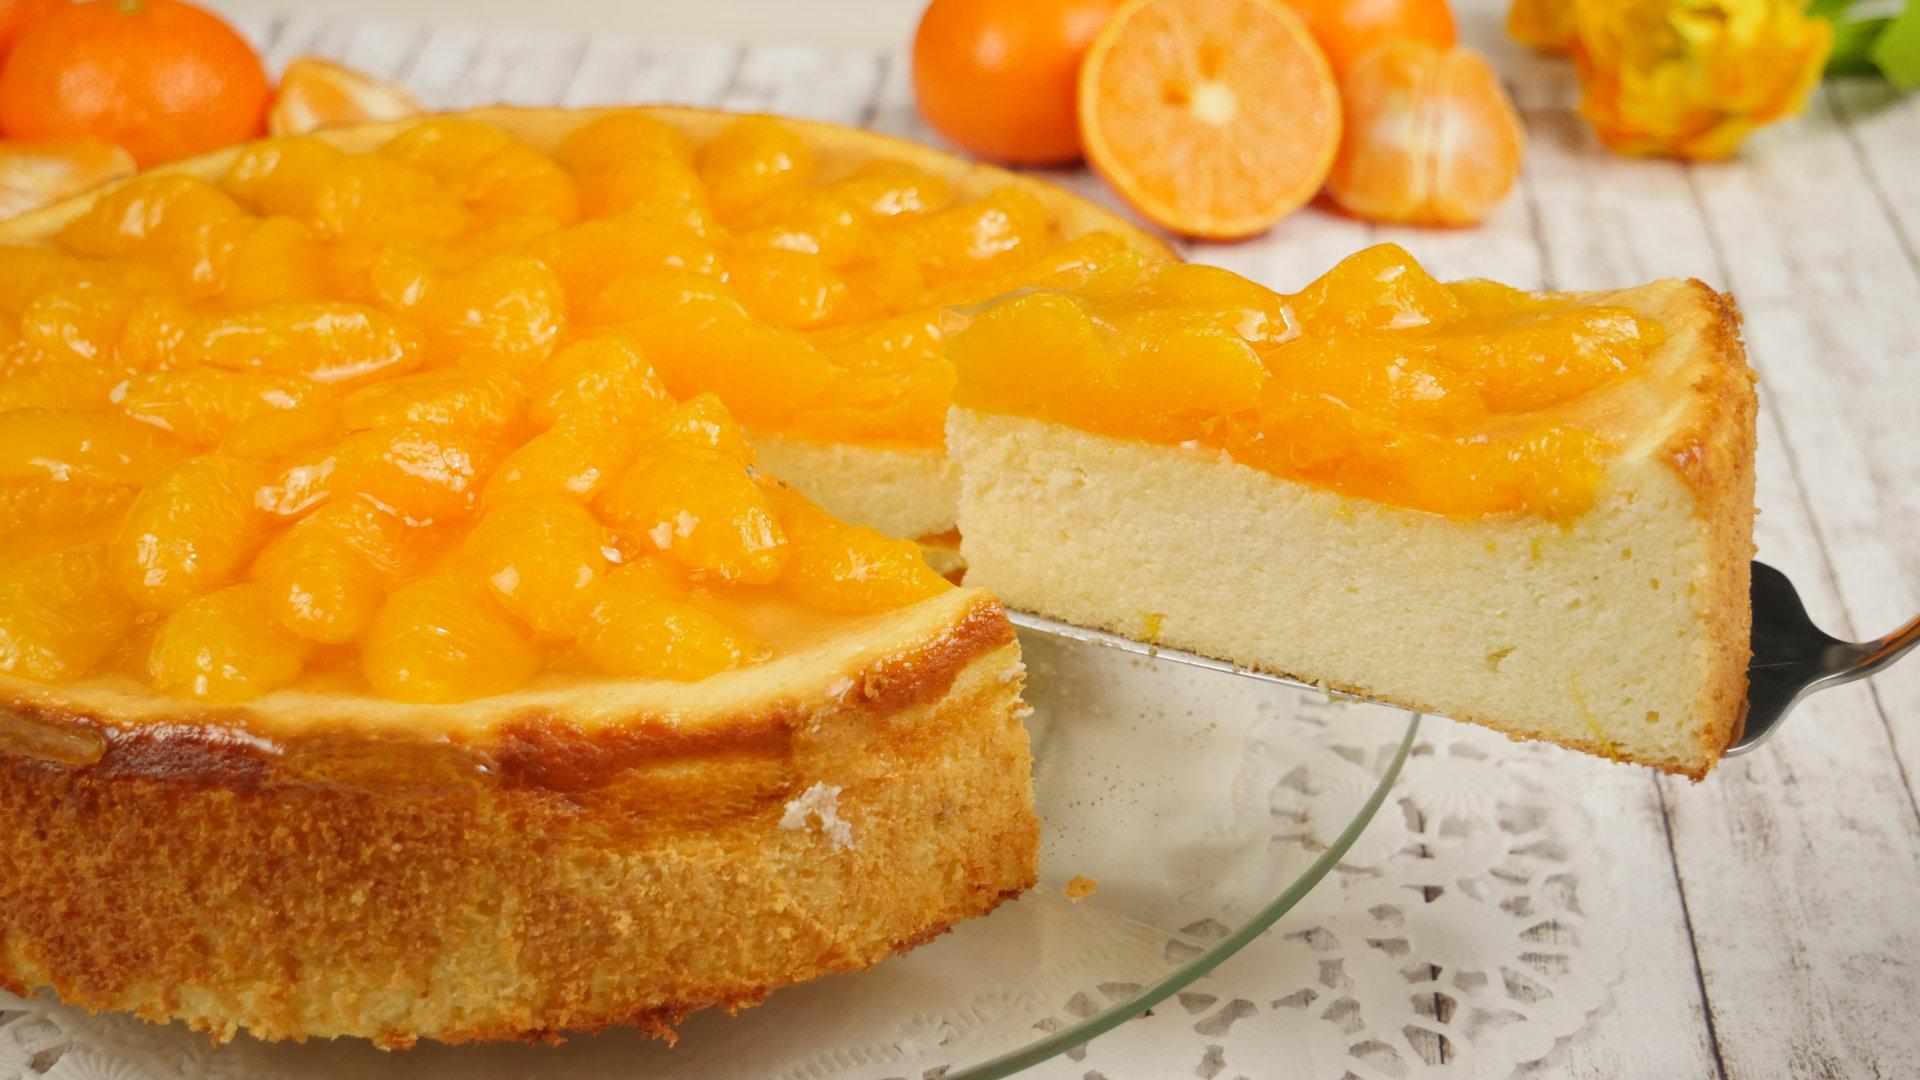 Rezept Mandarinen Käsekuchen Ohne Boden Frischer Saftiger